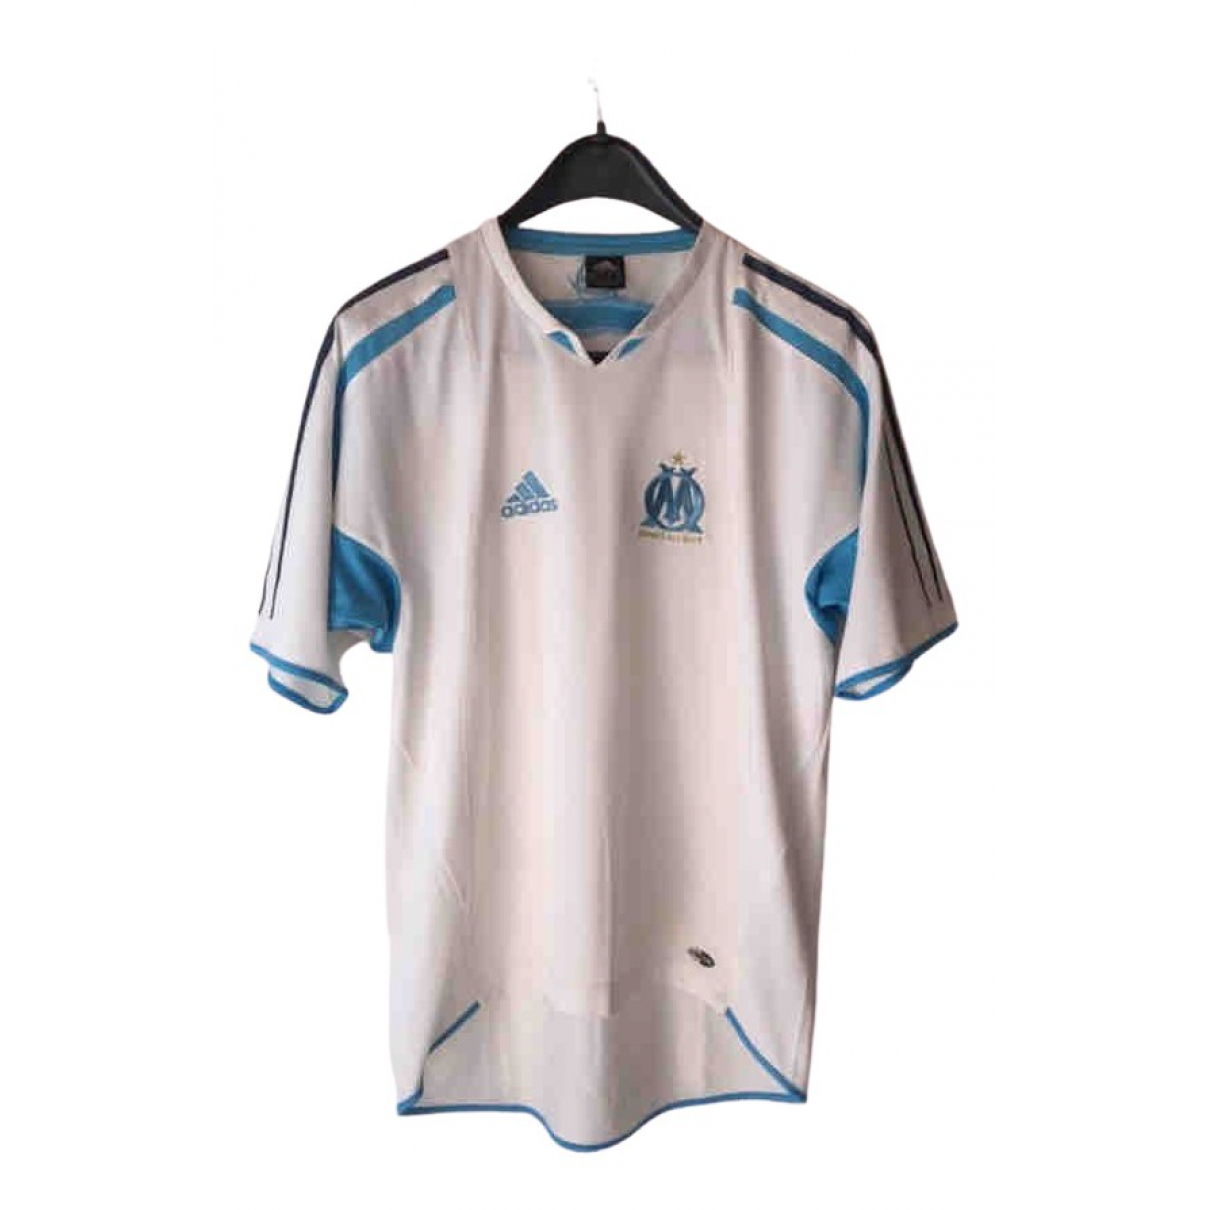 Adidas \N White Cotton T-shirts for Men M International